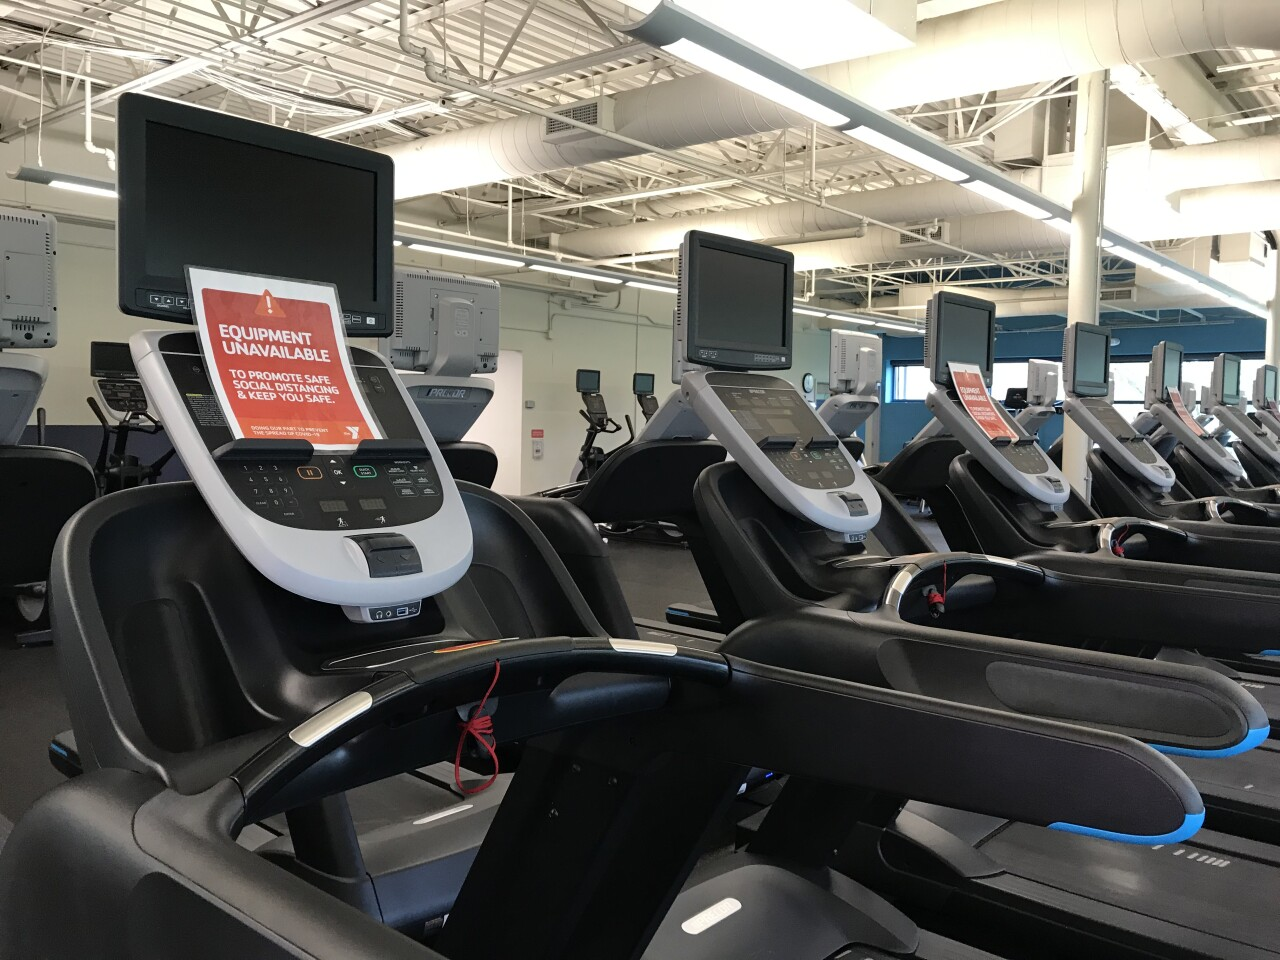 Row of treadmills at the YMCA